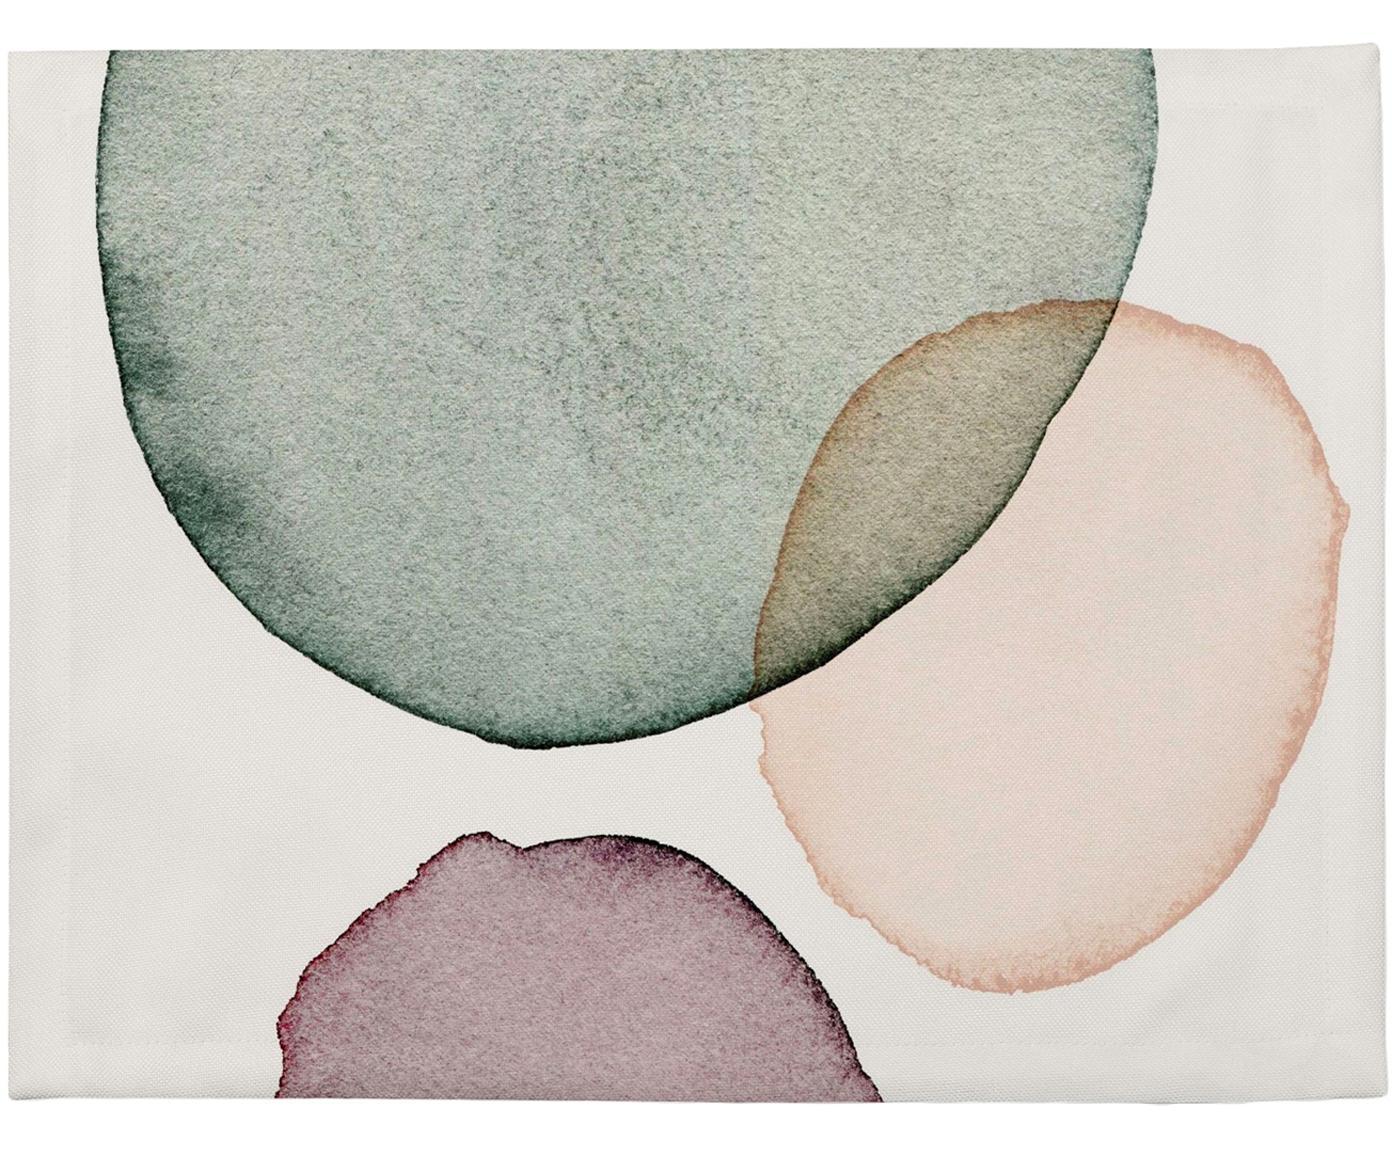 Placemats Calm, 4 stuks, Polyester, Wit, groen, lila, zalmkleurig, 35 x 45 cm